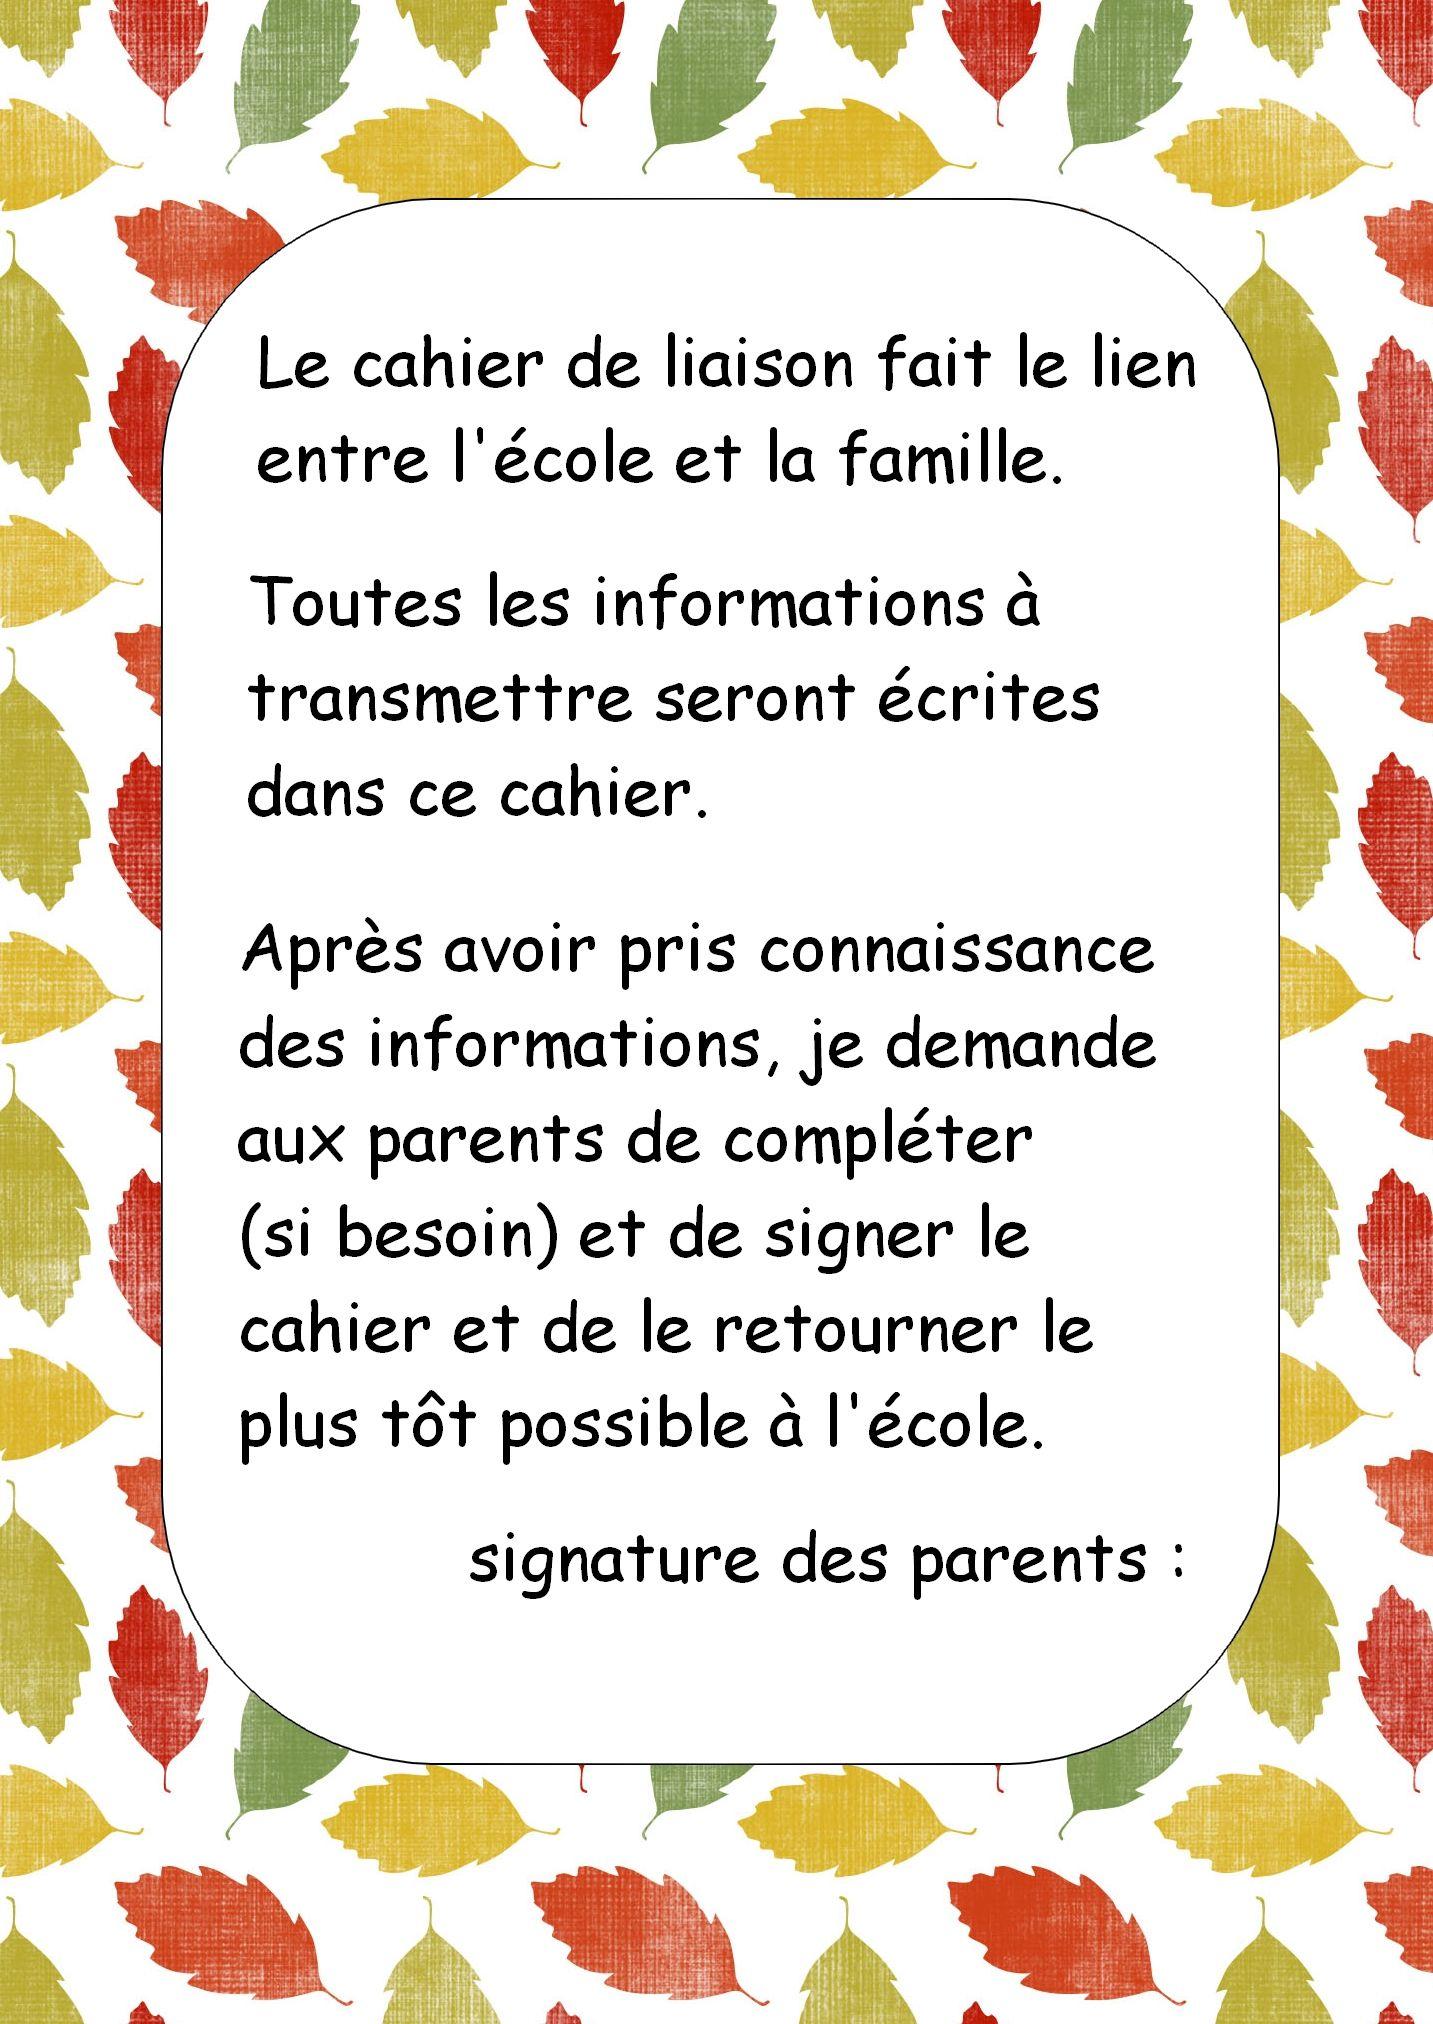 Cahier De Liaison Cahier De Vie Cahier De Liaison Cahier De Vie Maternelle Cahier De Vie